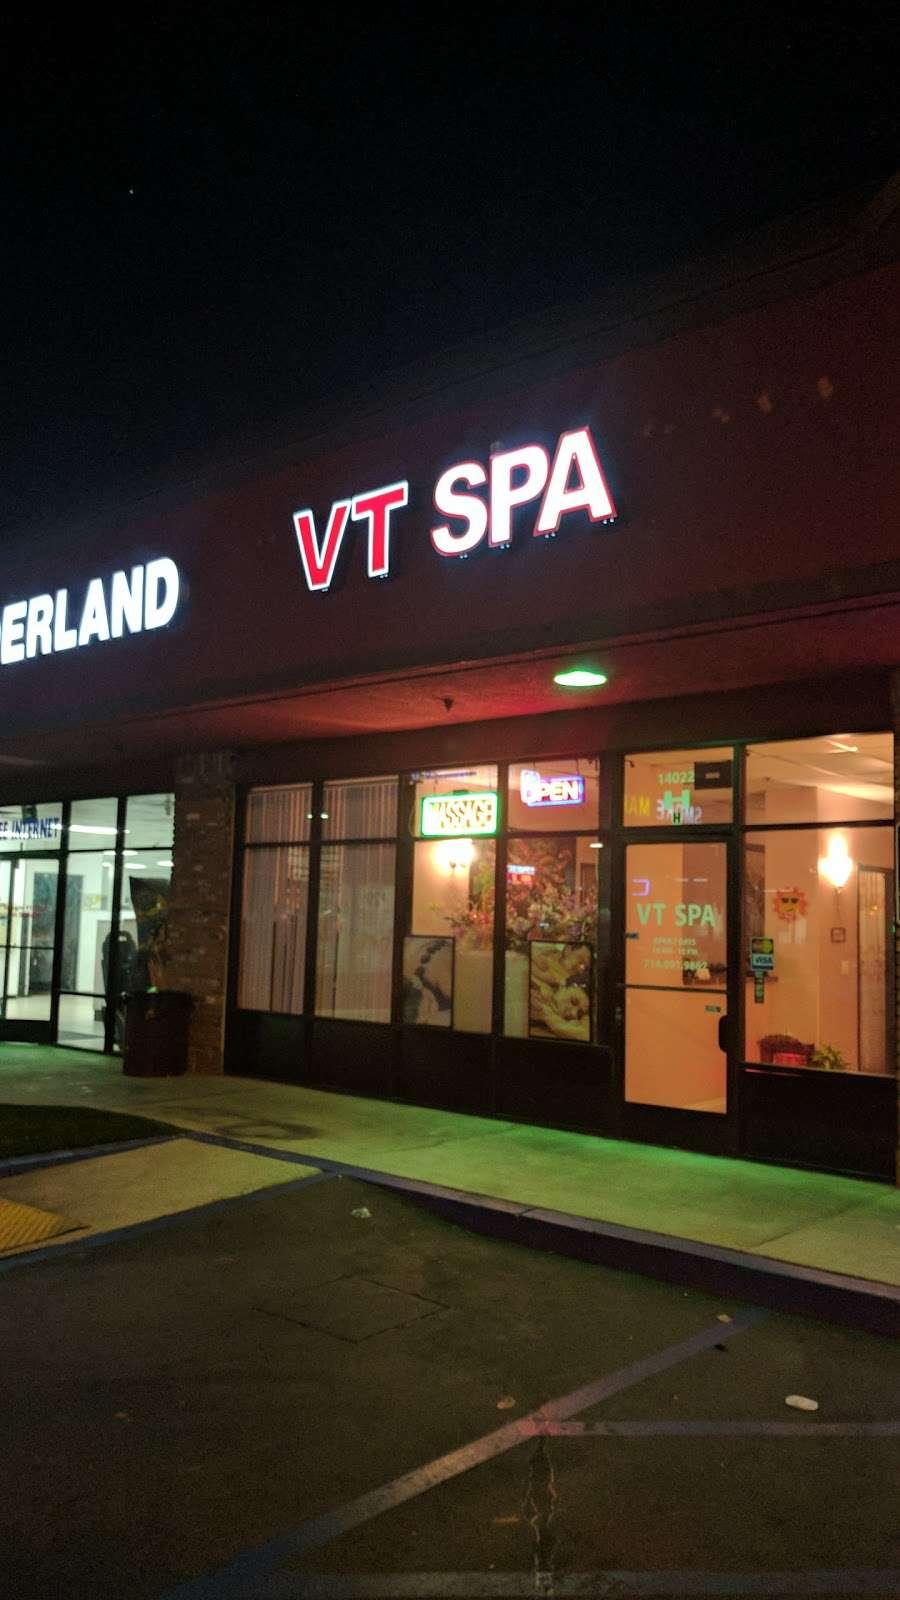 VT Spa - spa  | Photo 1 of 1 | Address: 14022 Springdale St, Westminster, CA 92683, USA | Phone: (714) 891-9862